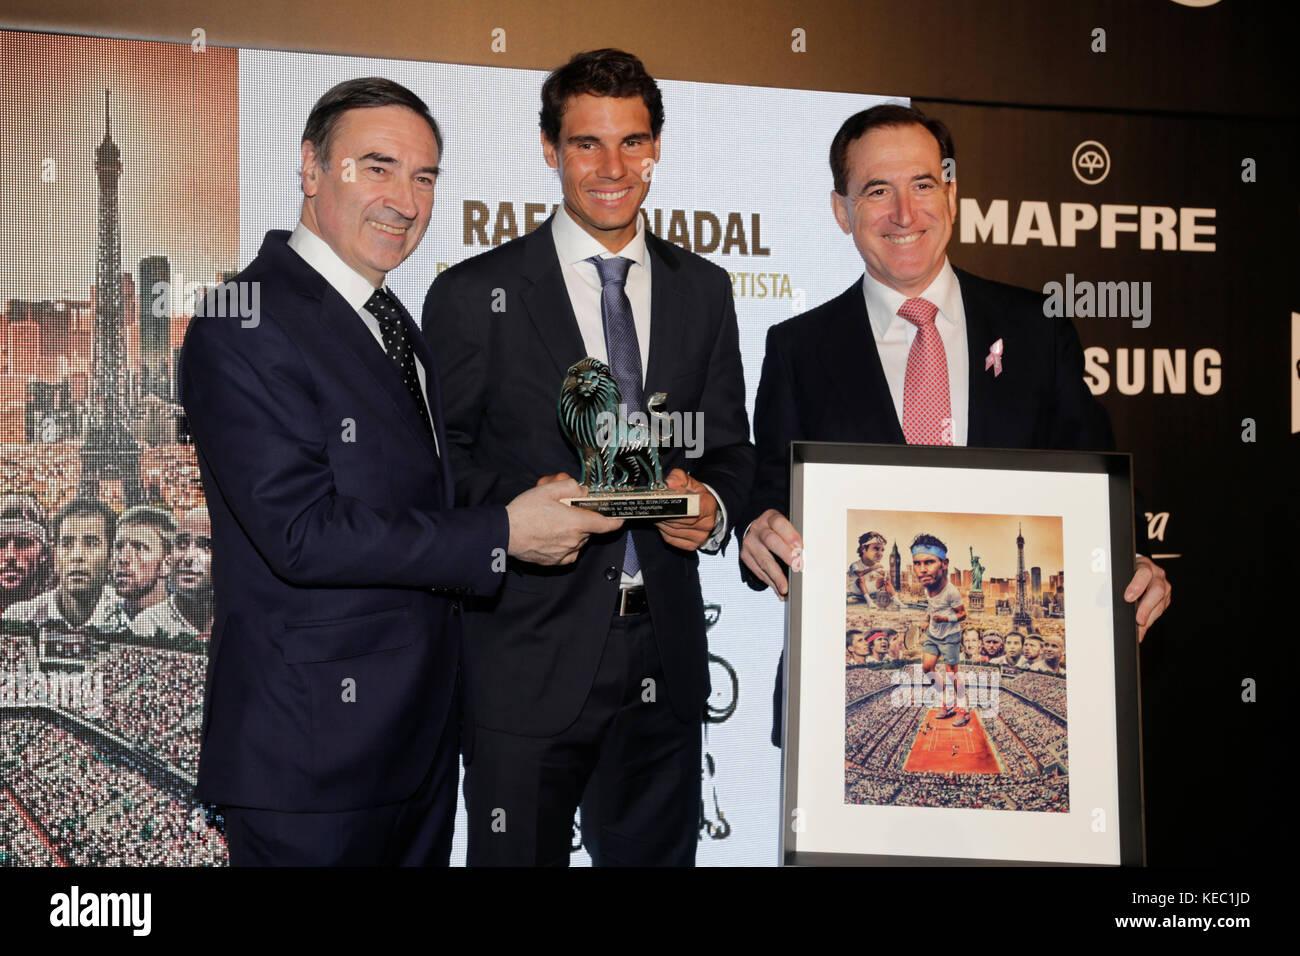 Journalist Pedro J Ramirez,Rafa Nadal during the celebration of the Awards Leones ''El Español'' - Stock Image